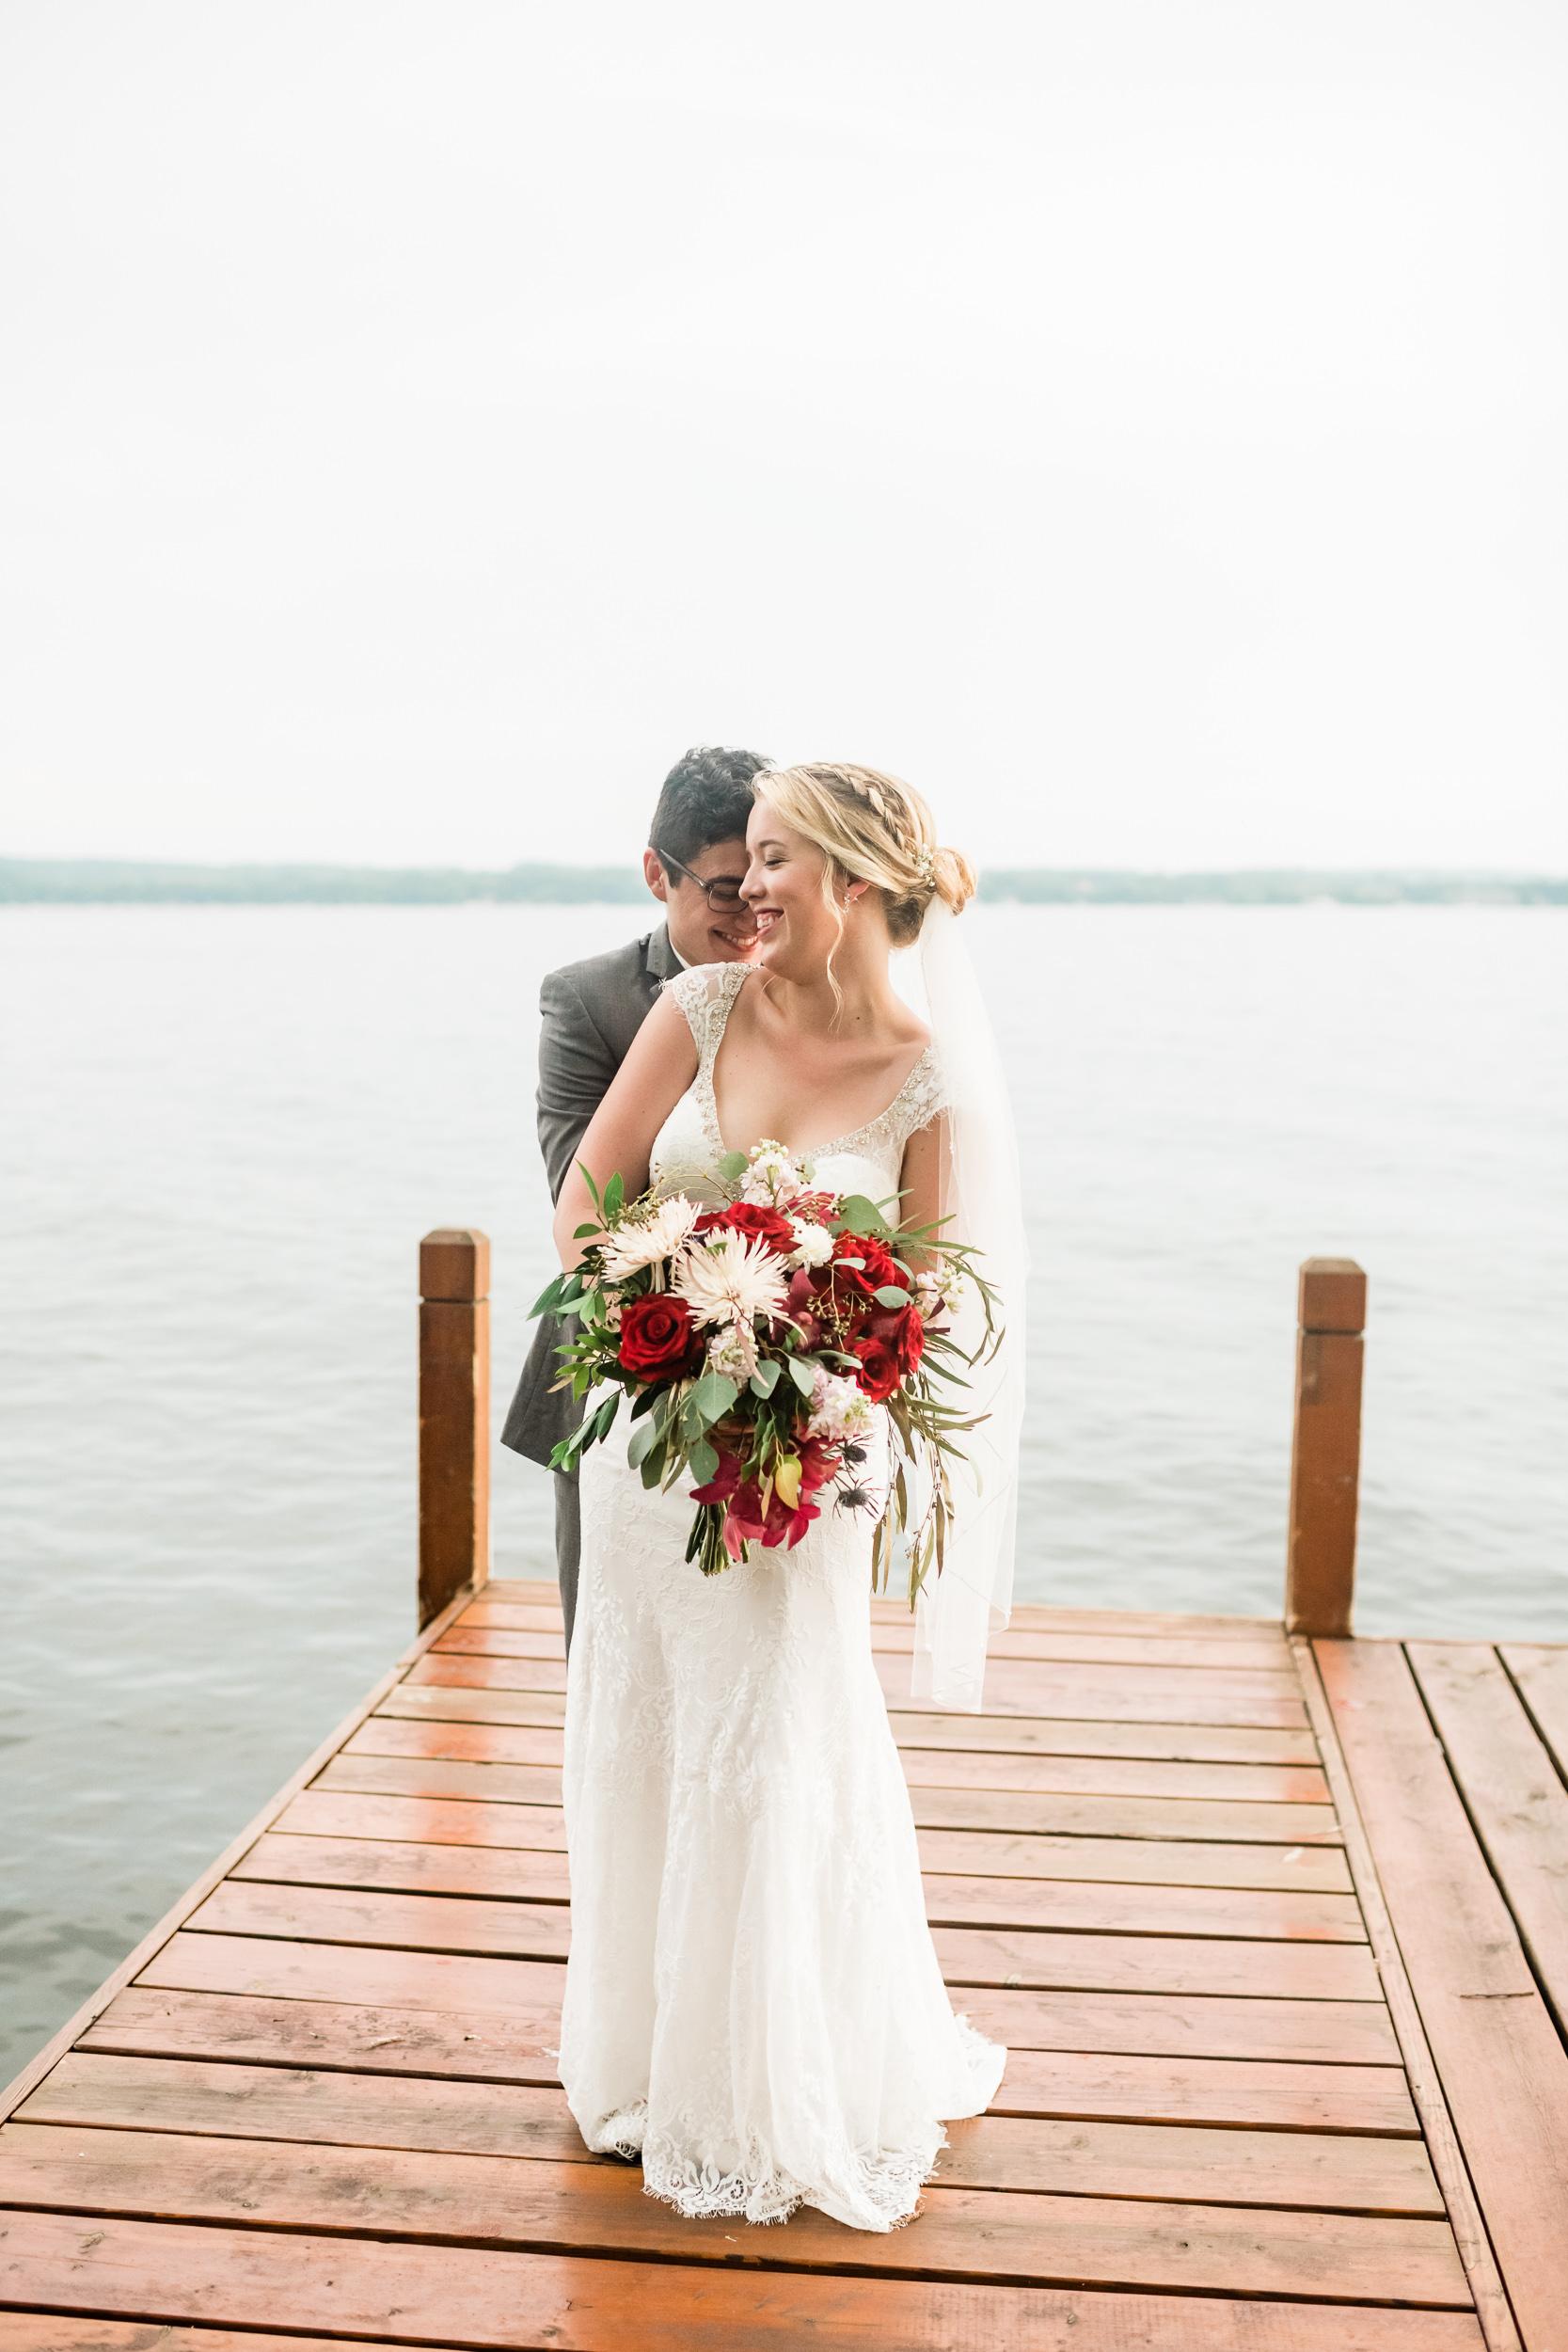 Groom hugging bride from behind on a dock